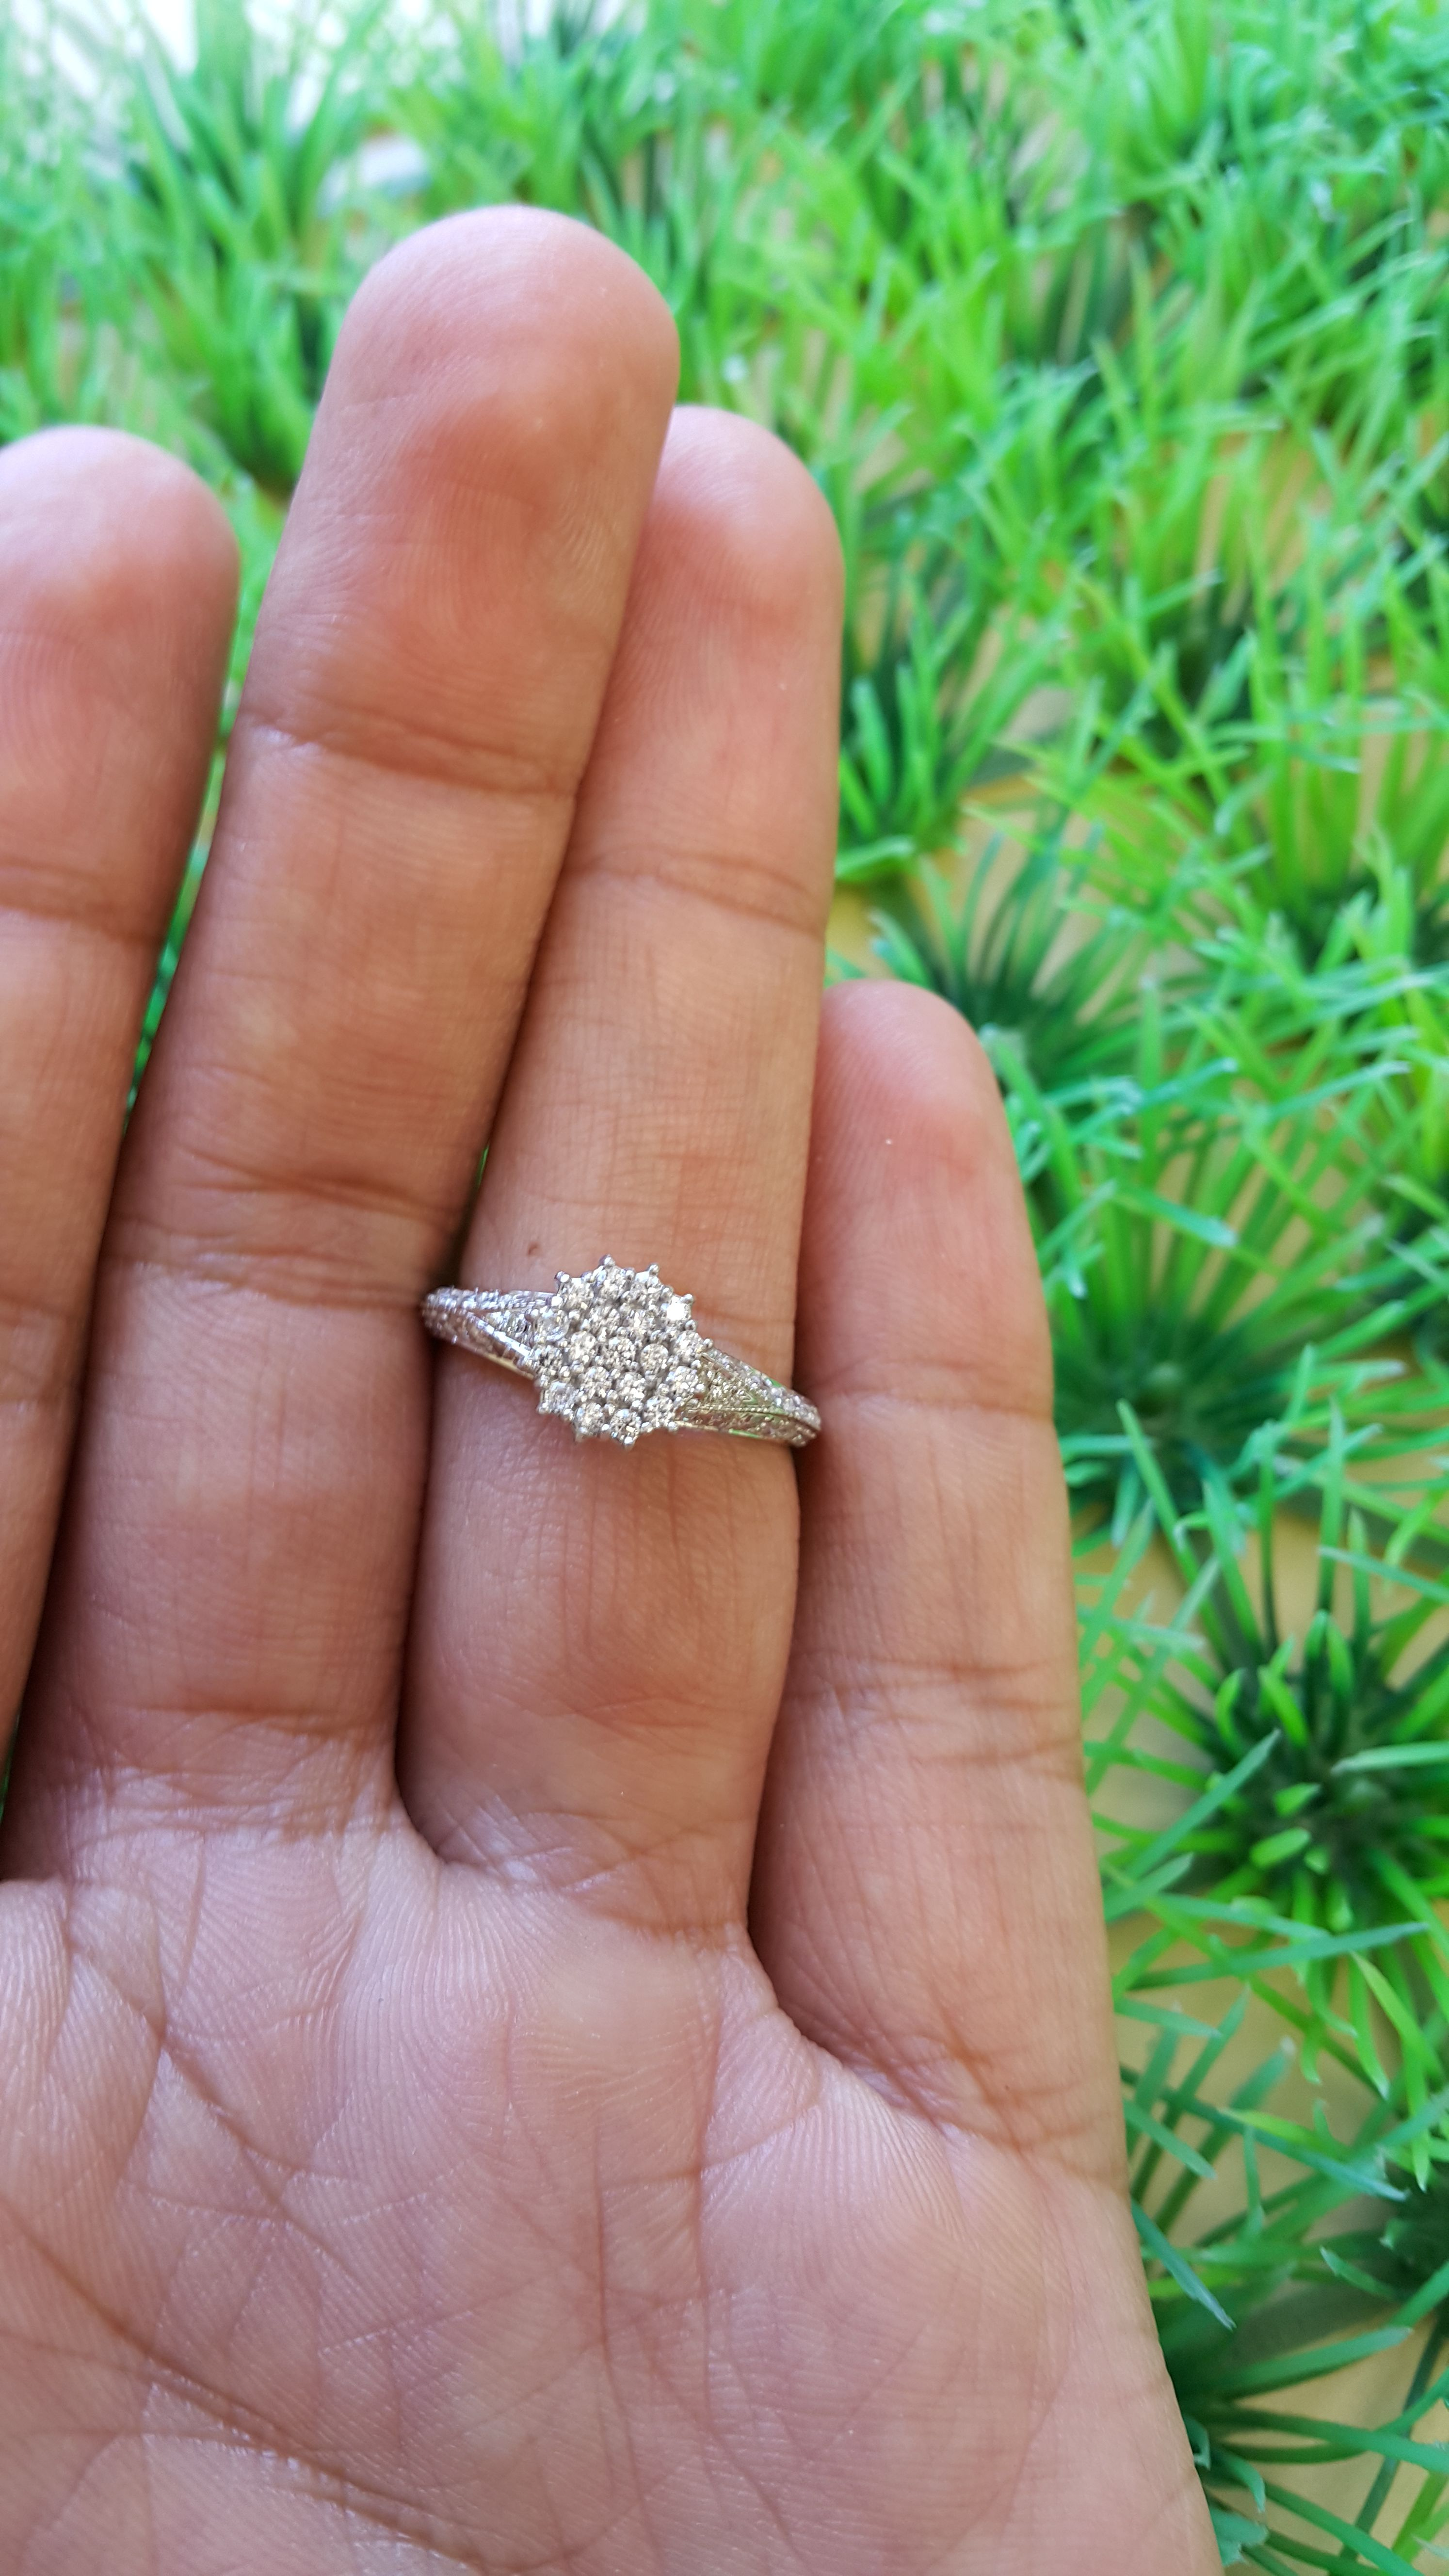 Rings on Hand Engagement Ring BT703YE Wedding ring